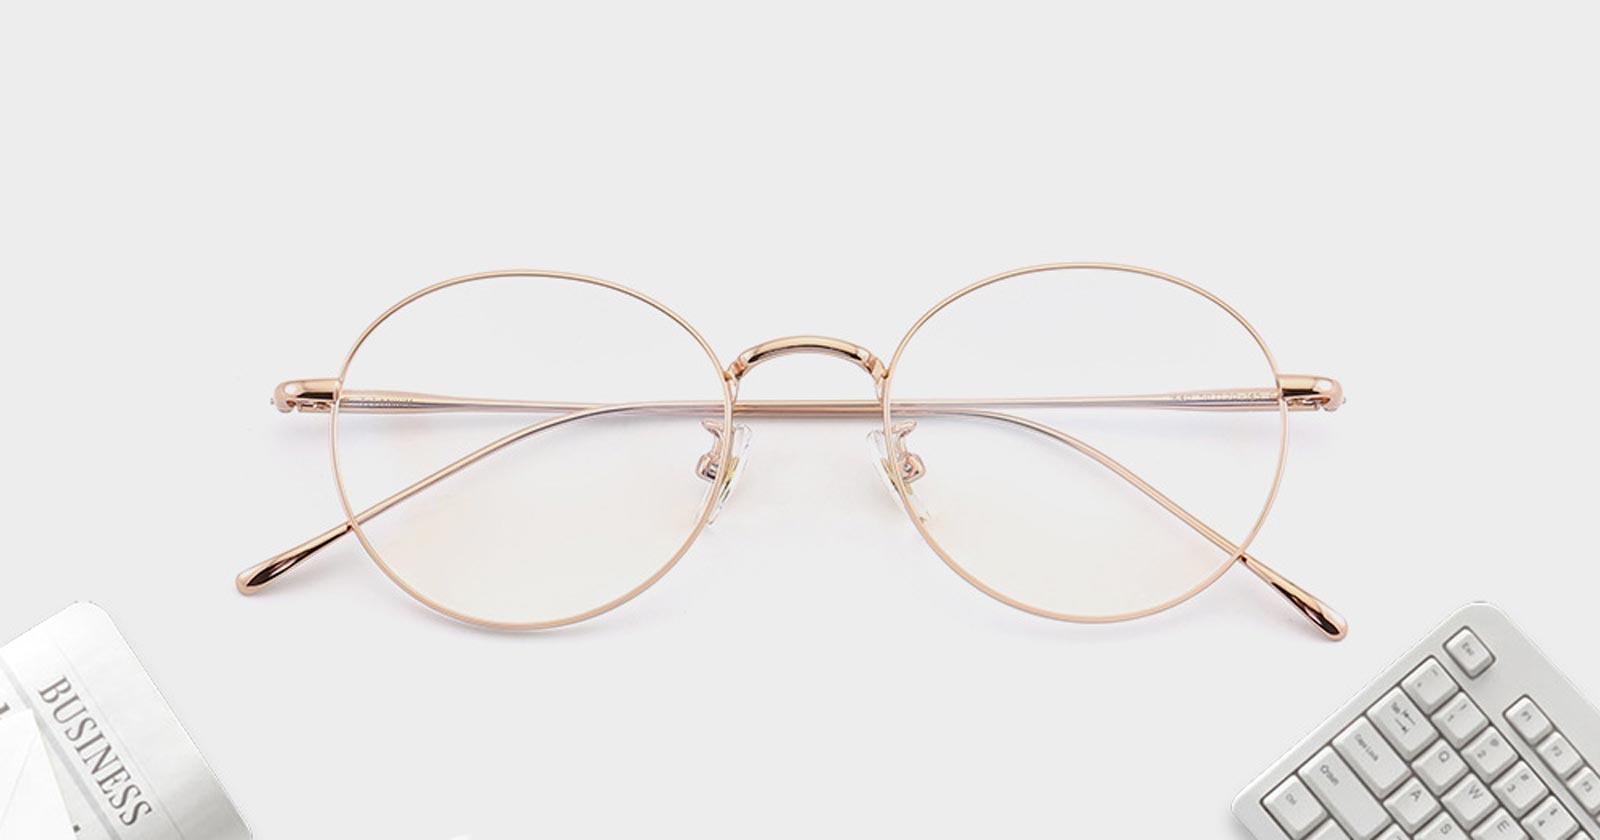 The Development of Round Frame Glasses